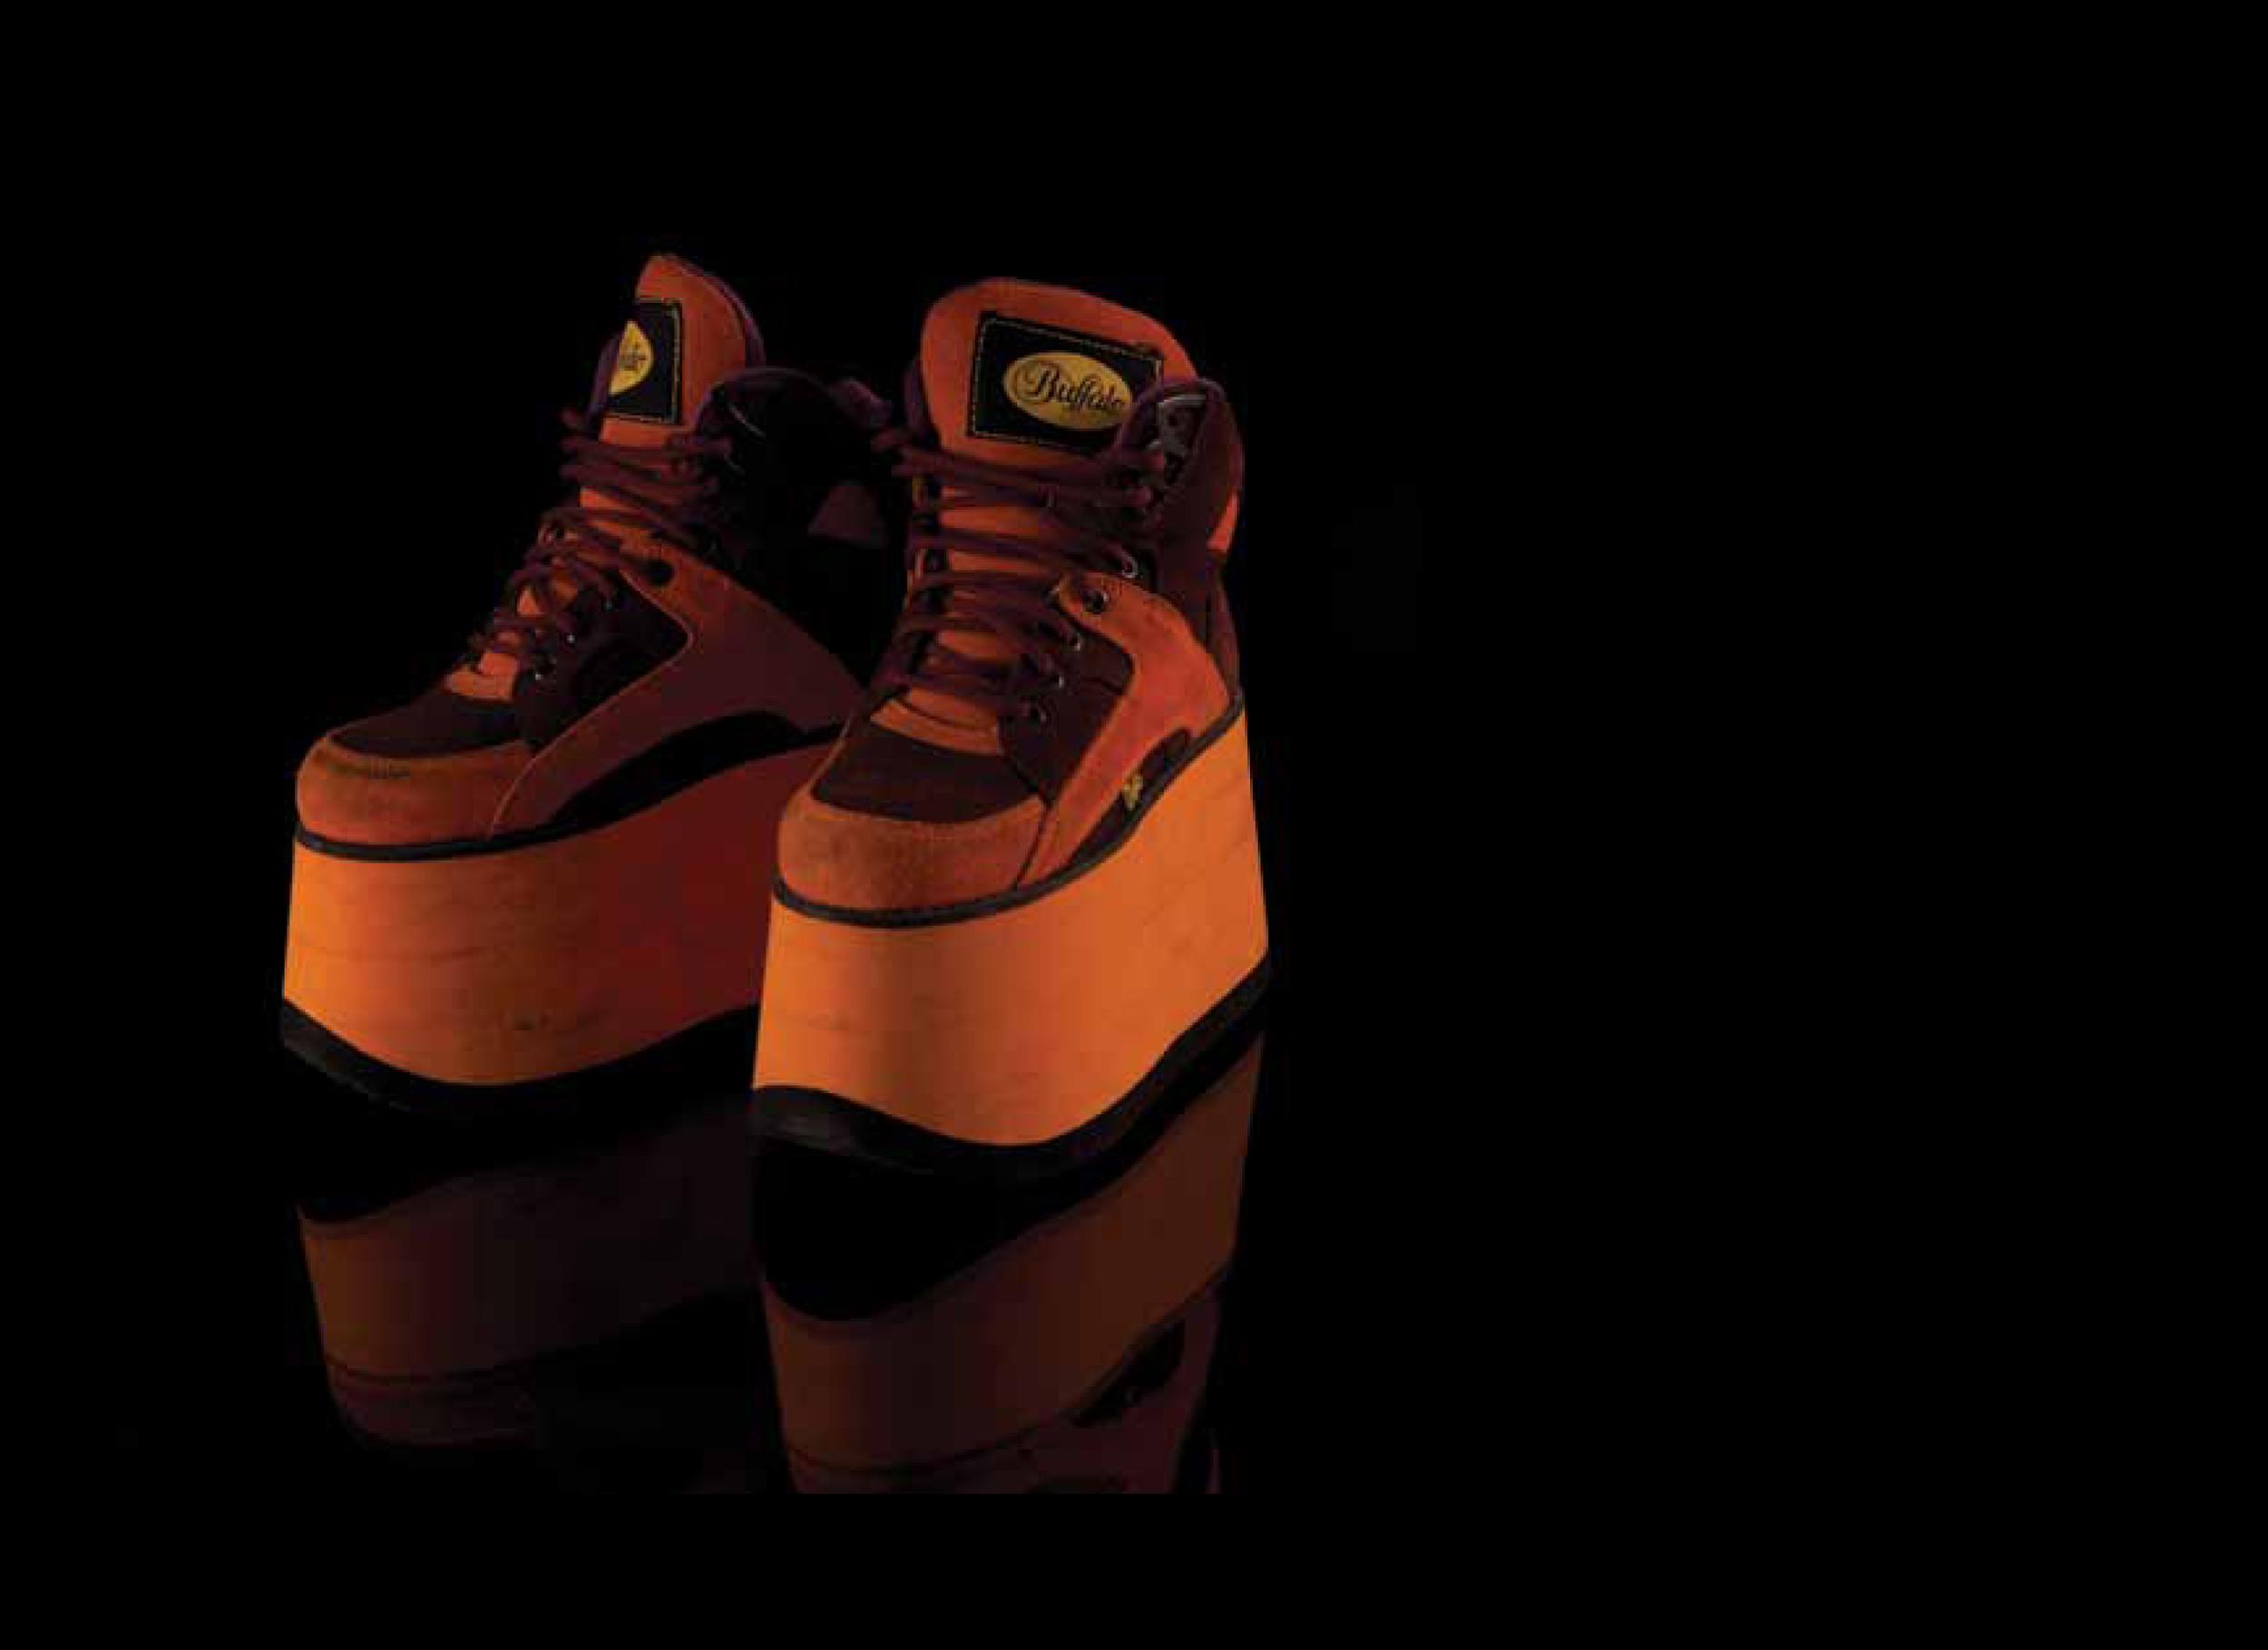 Image: Mel B, Brit Awards, 1998. Orange four-inch platform soled trainers with black tread. Designed by Buffalo